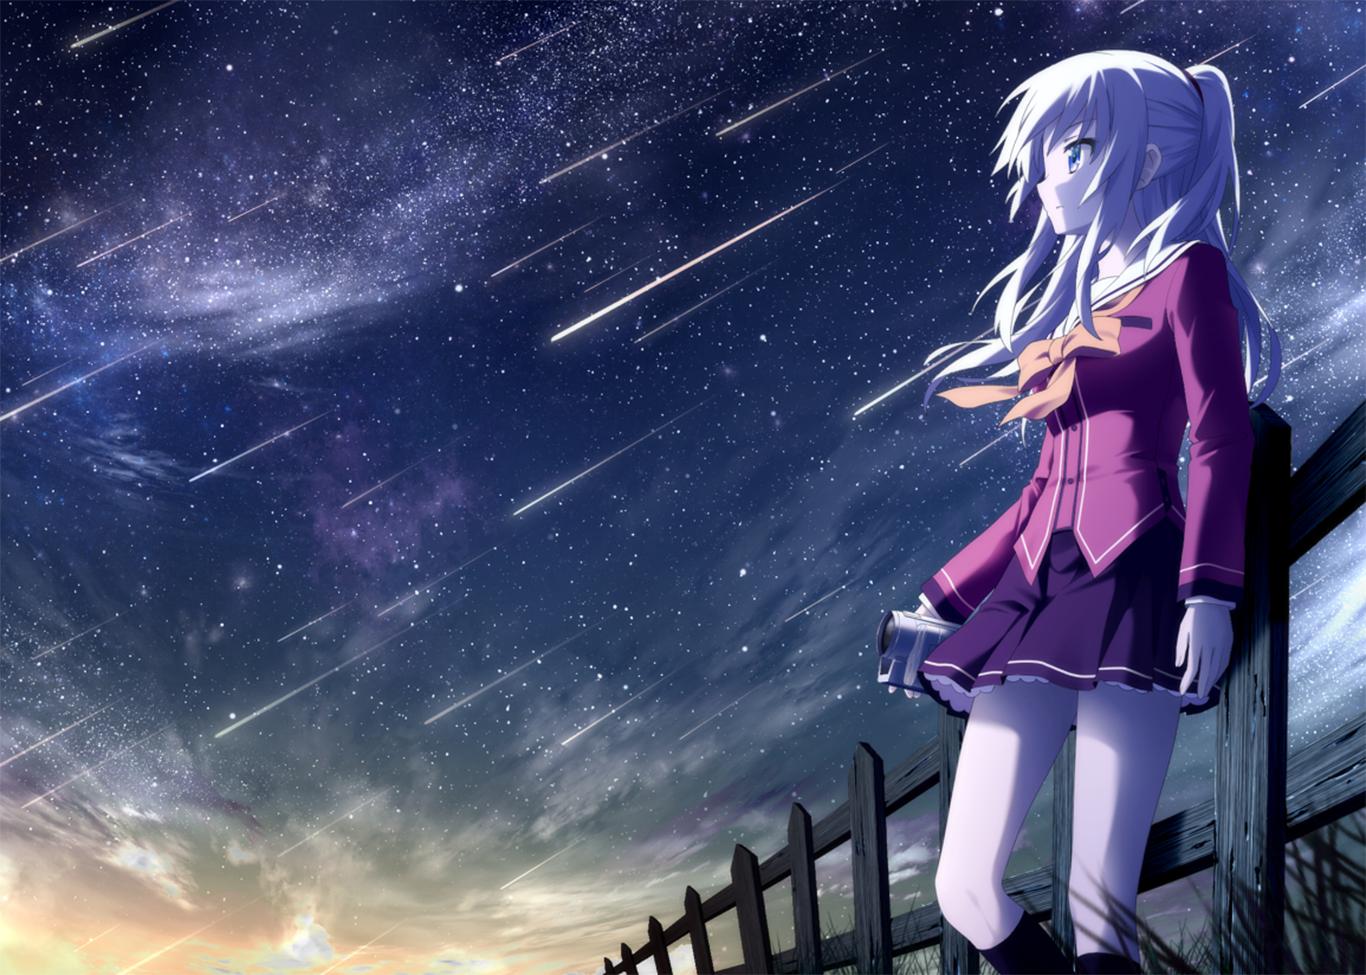 Nao シャルロット シャーロット Anime 壁紙 38990409 ファン